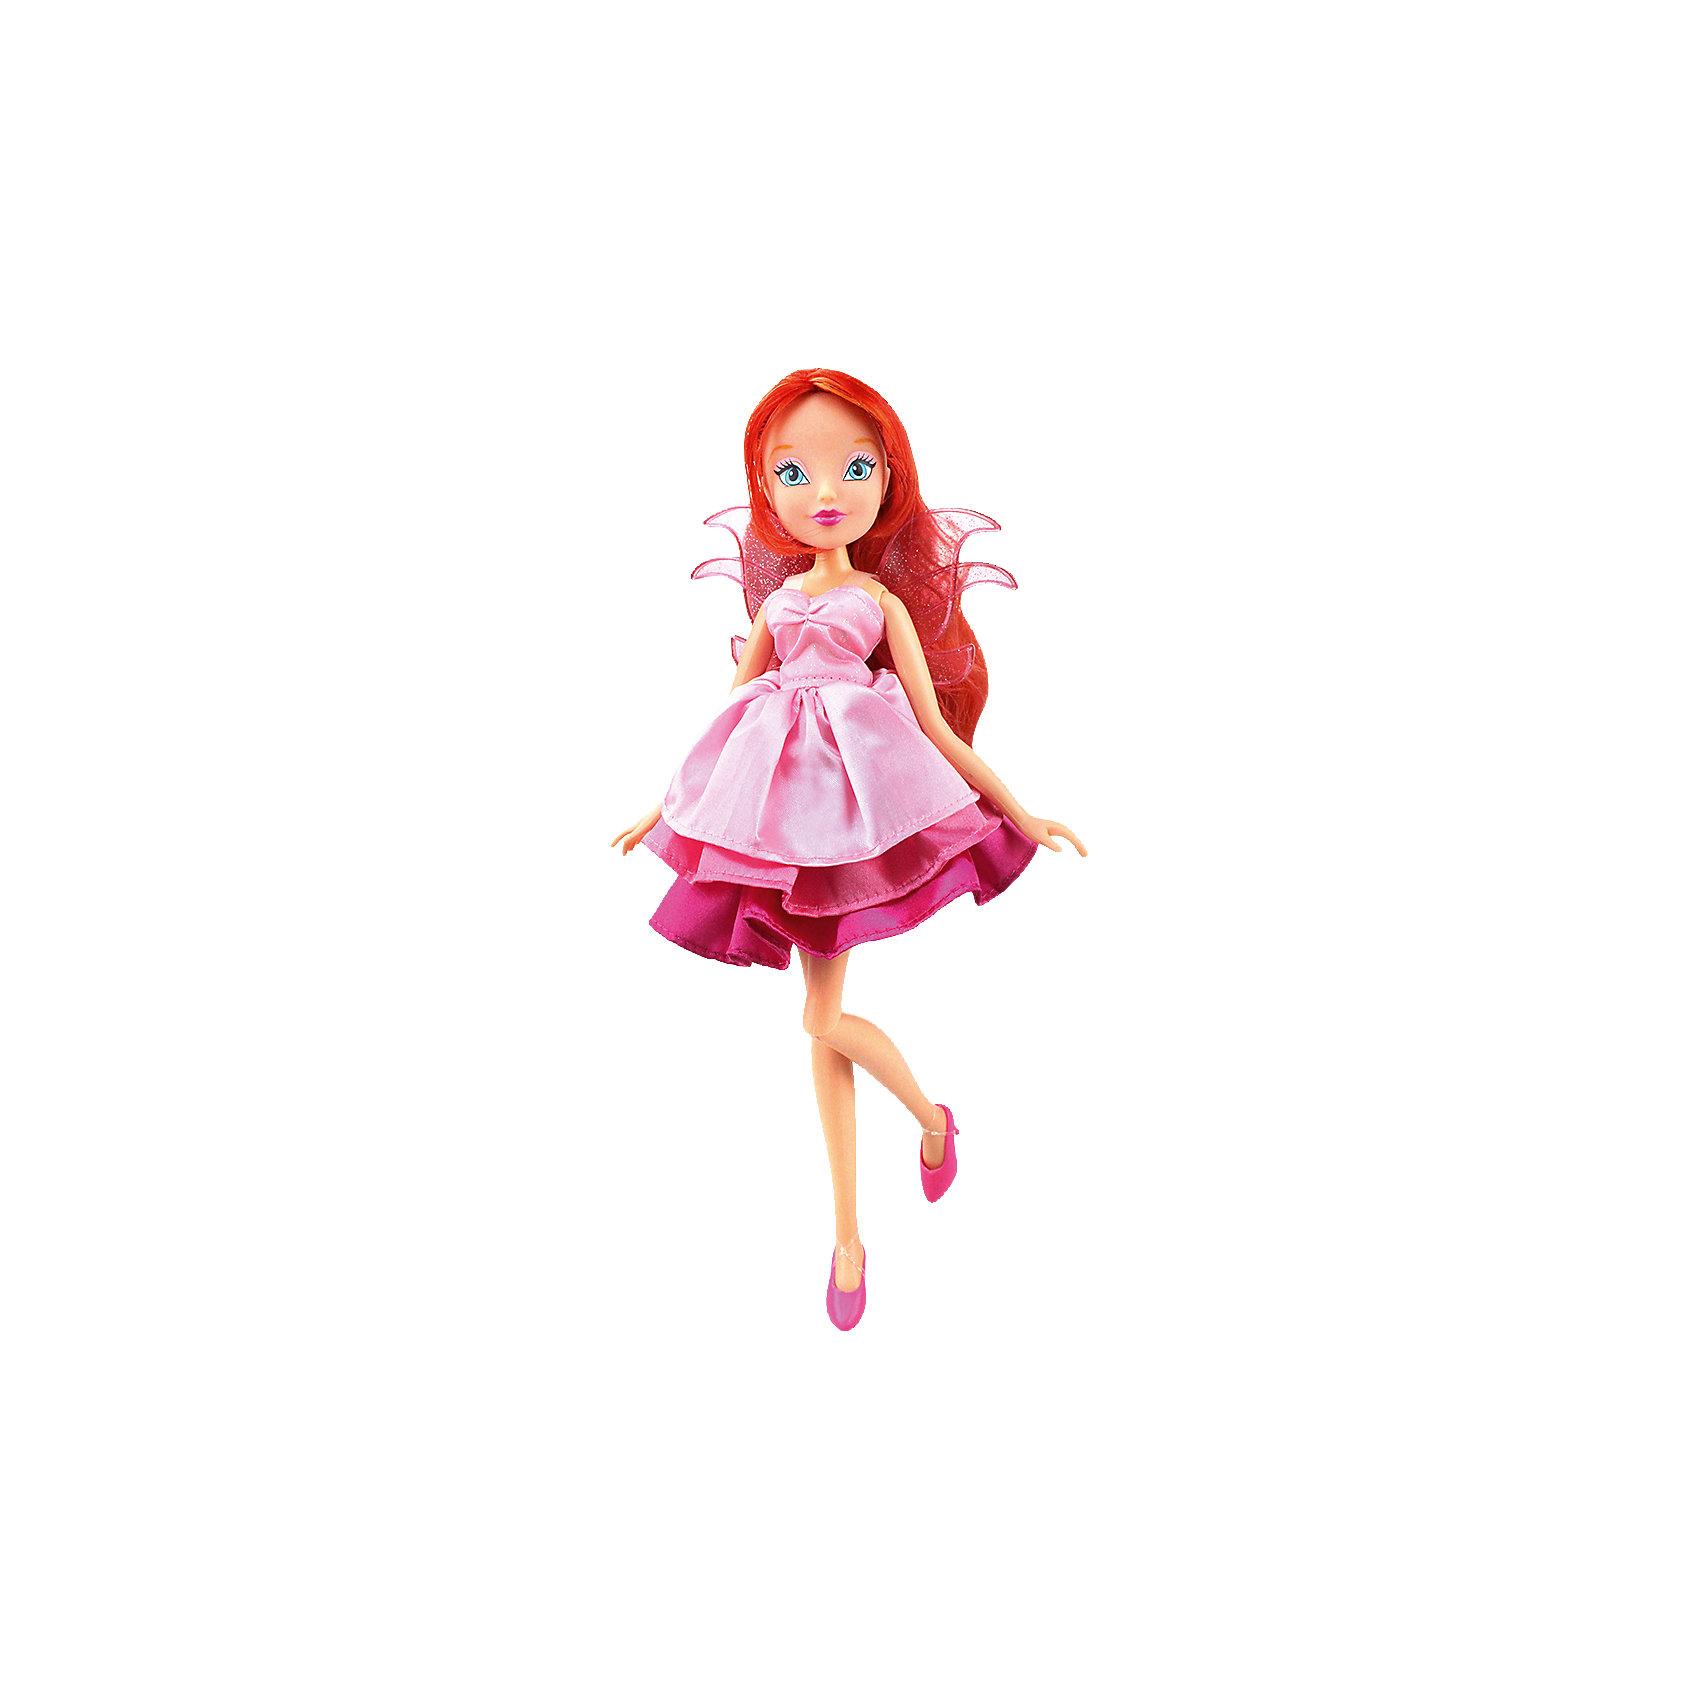 Кукла Блум Волшебное платье, Winx ClubDoll Winx Club a Magical dress, Bloom<br><br>Ширина мм: 60<br>Глубина мм: 355<br>Высота мм: 210<br>Вес г: 304<br>Возраст от месяцев: 36<br>Возраст до месяцев: 120<br>Пол: Женский<br>Возраст: Детский<br>SKU: 5532625